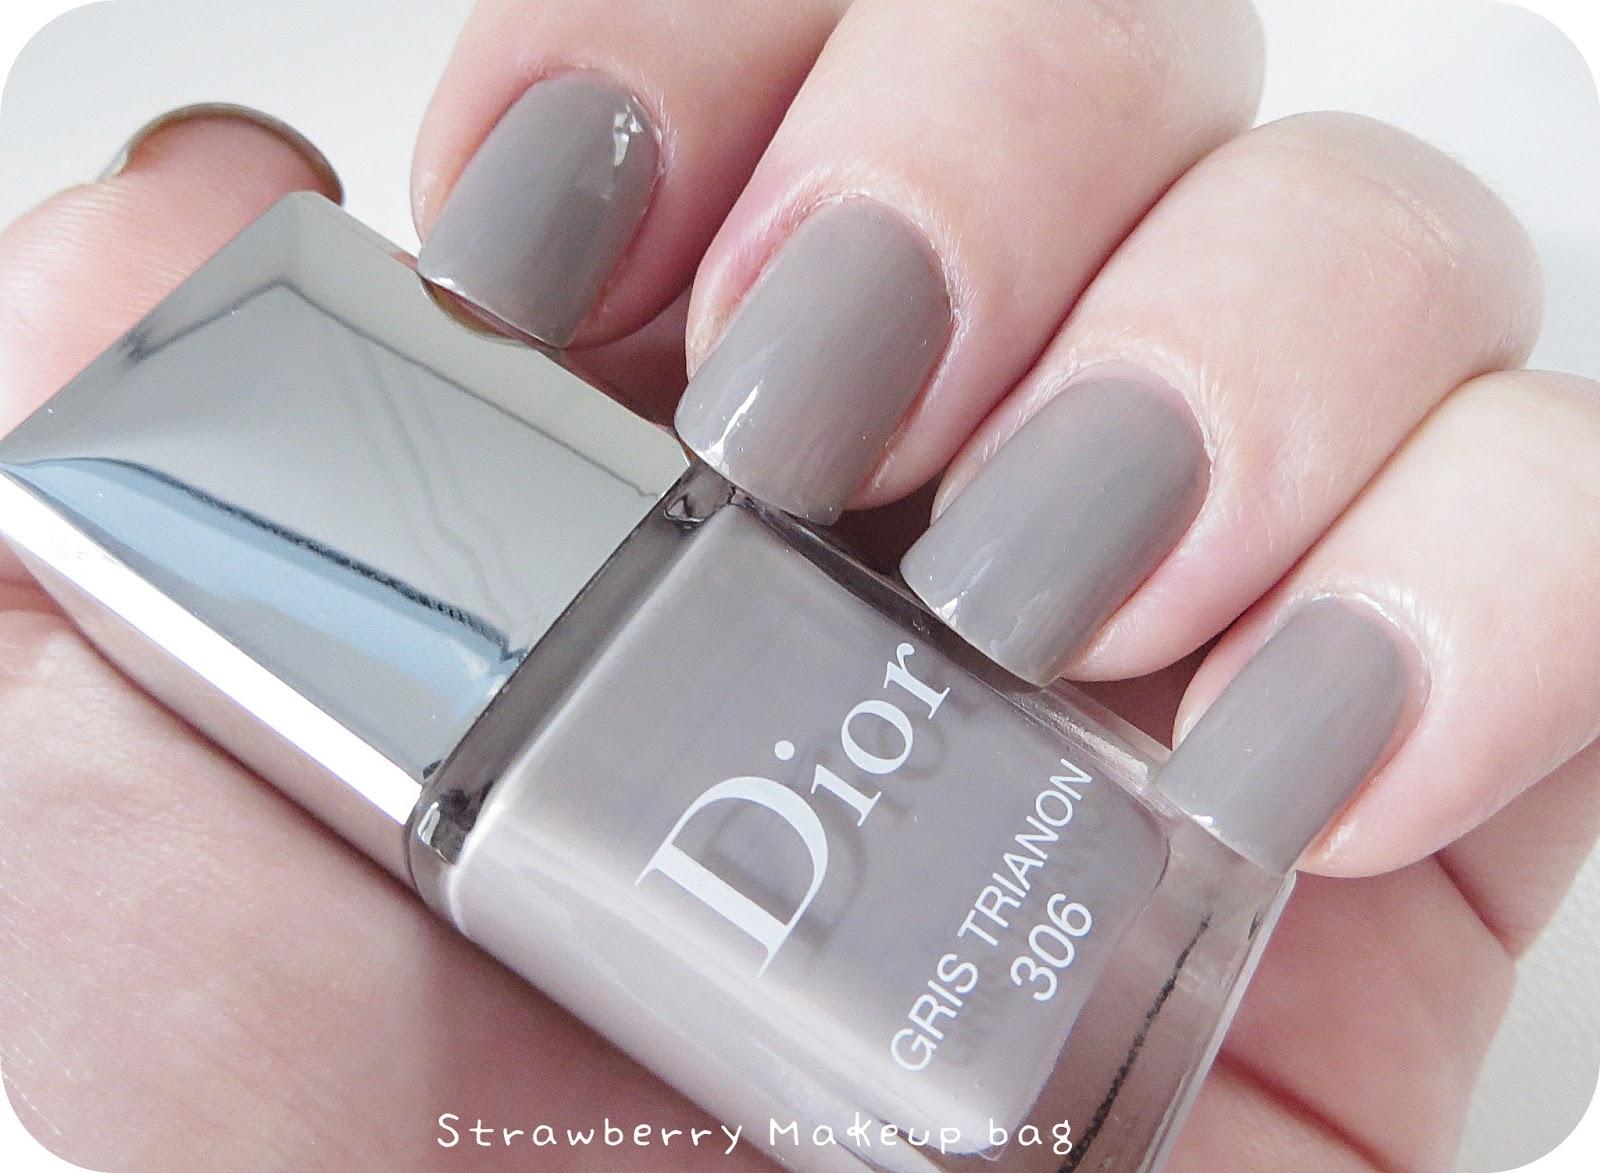 strawberry makeup bag notd dior gris trianon. Black Bedroom Furniture Sets. Home Design Ideas